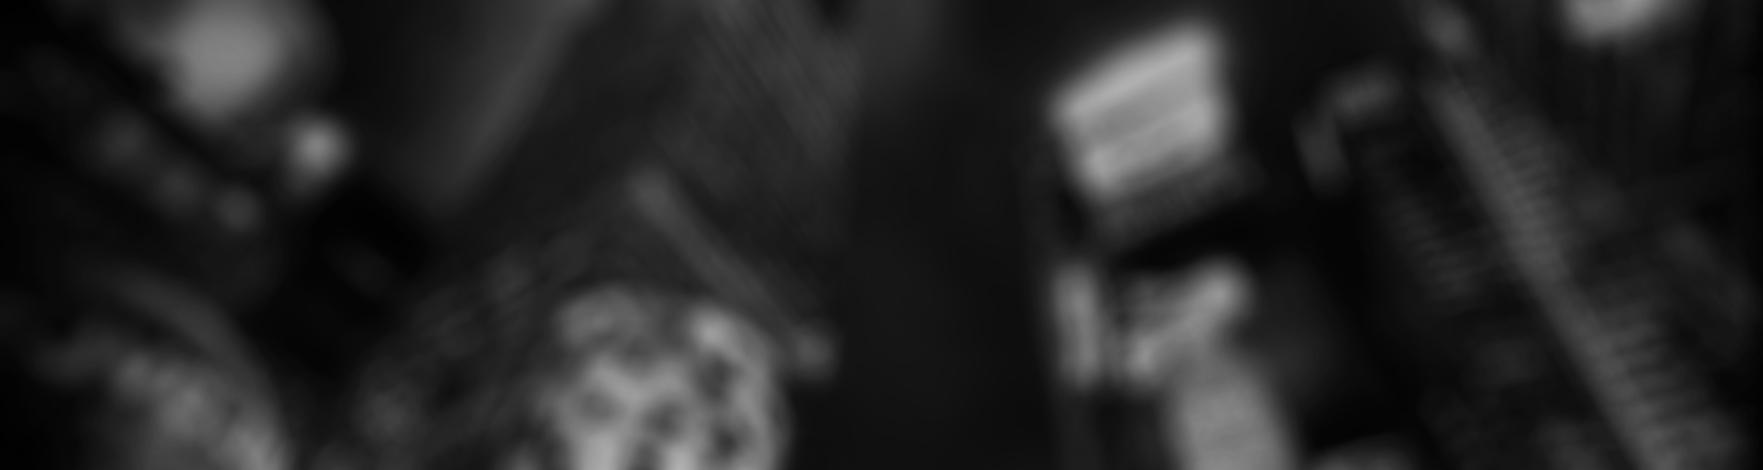 blurred-city